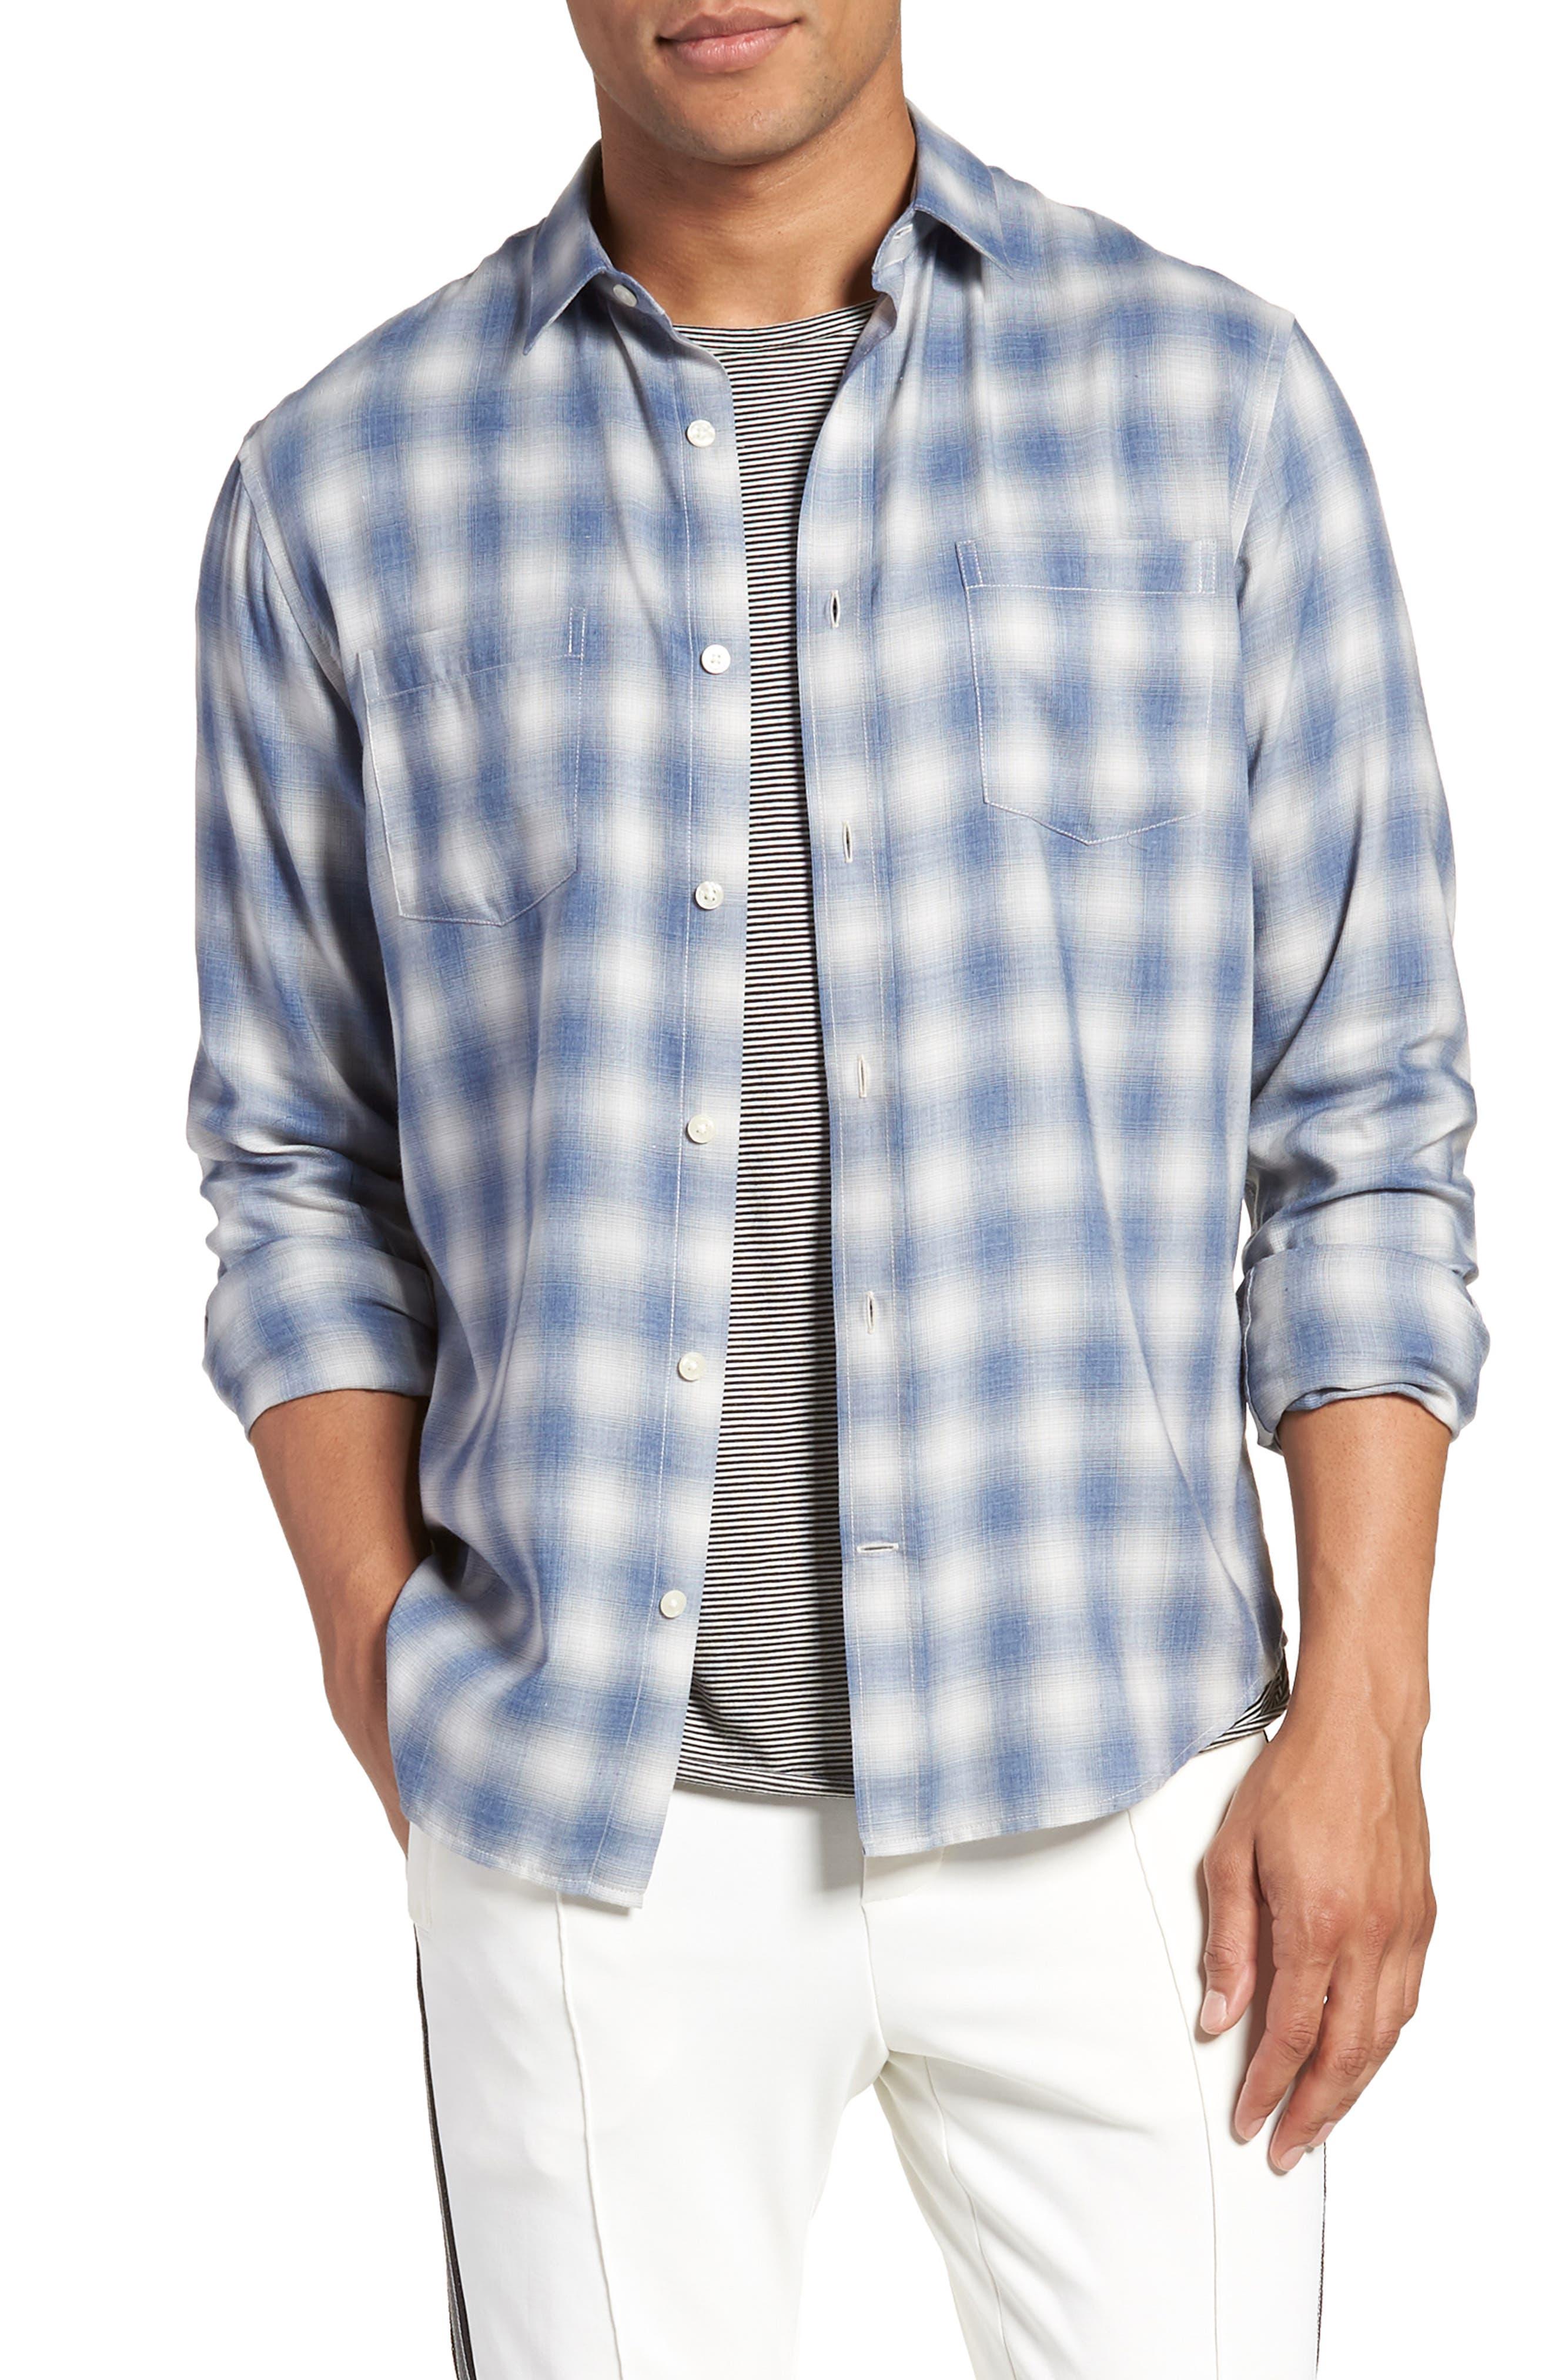 Shadow Slim Fit Plaid Sport Shirt,                             Main thumbnail 1, color,                             Spruce Blue